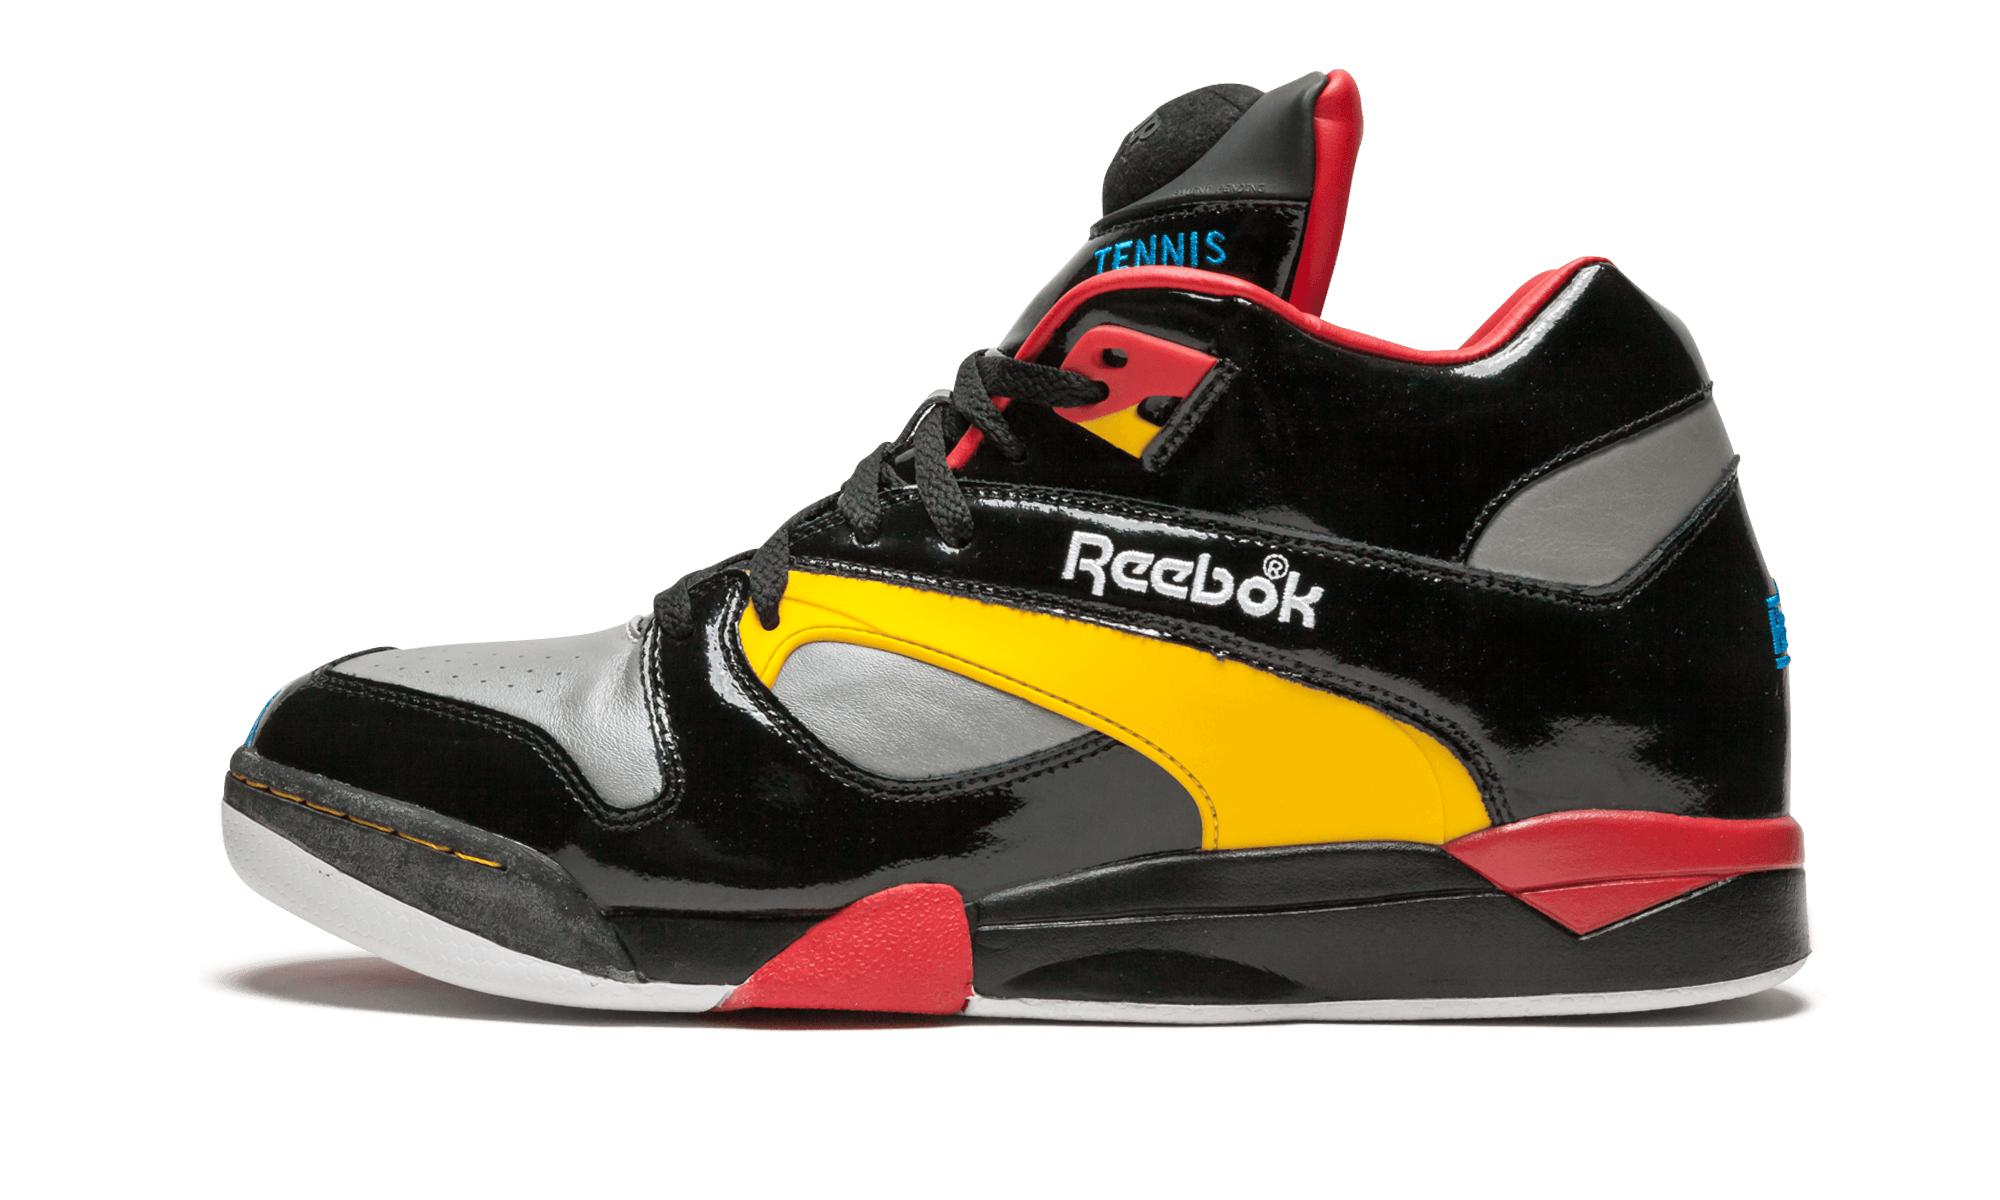 Reebok - Black Court Victory Pump for Men - Lyst. View fullscreen 1c7c8cb03cc3